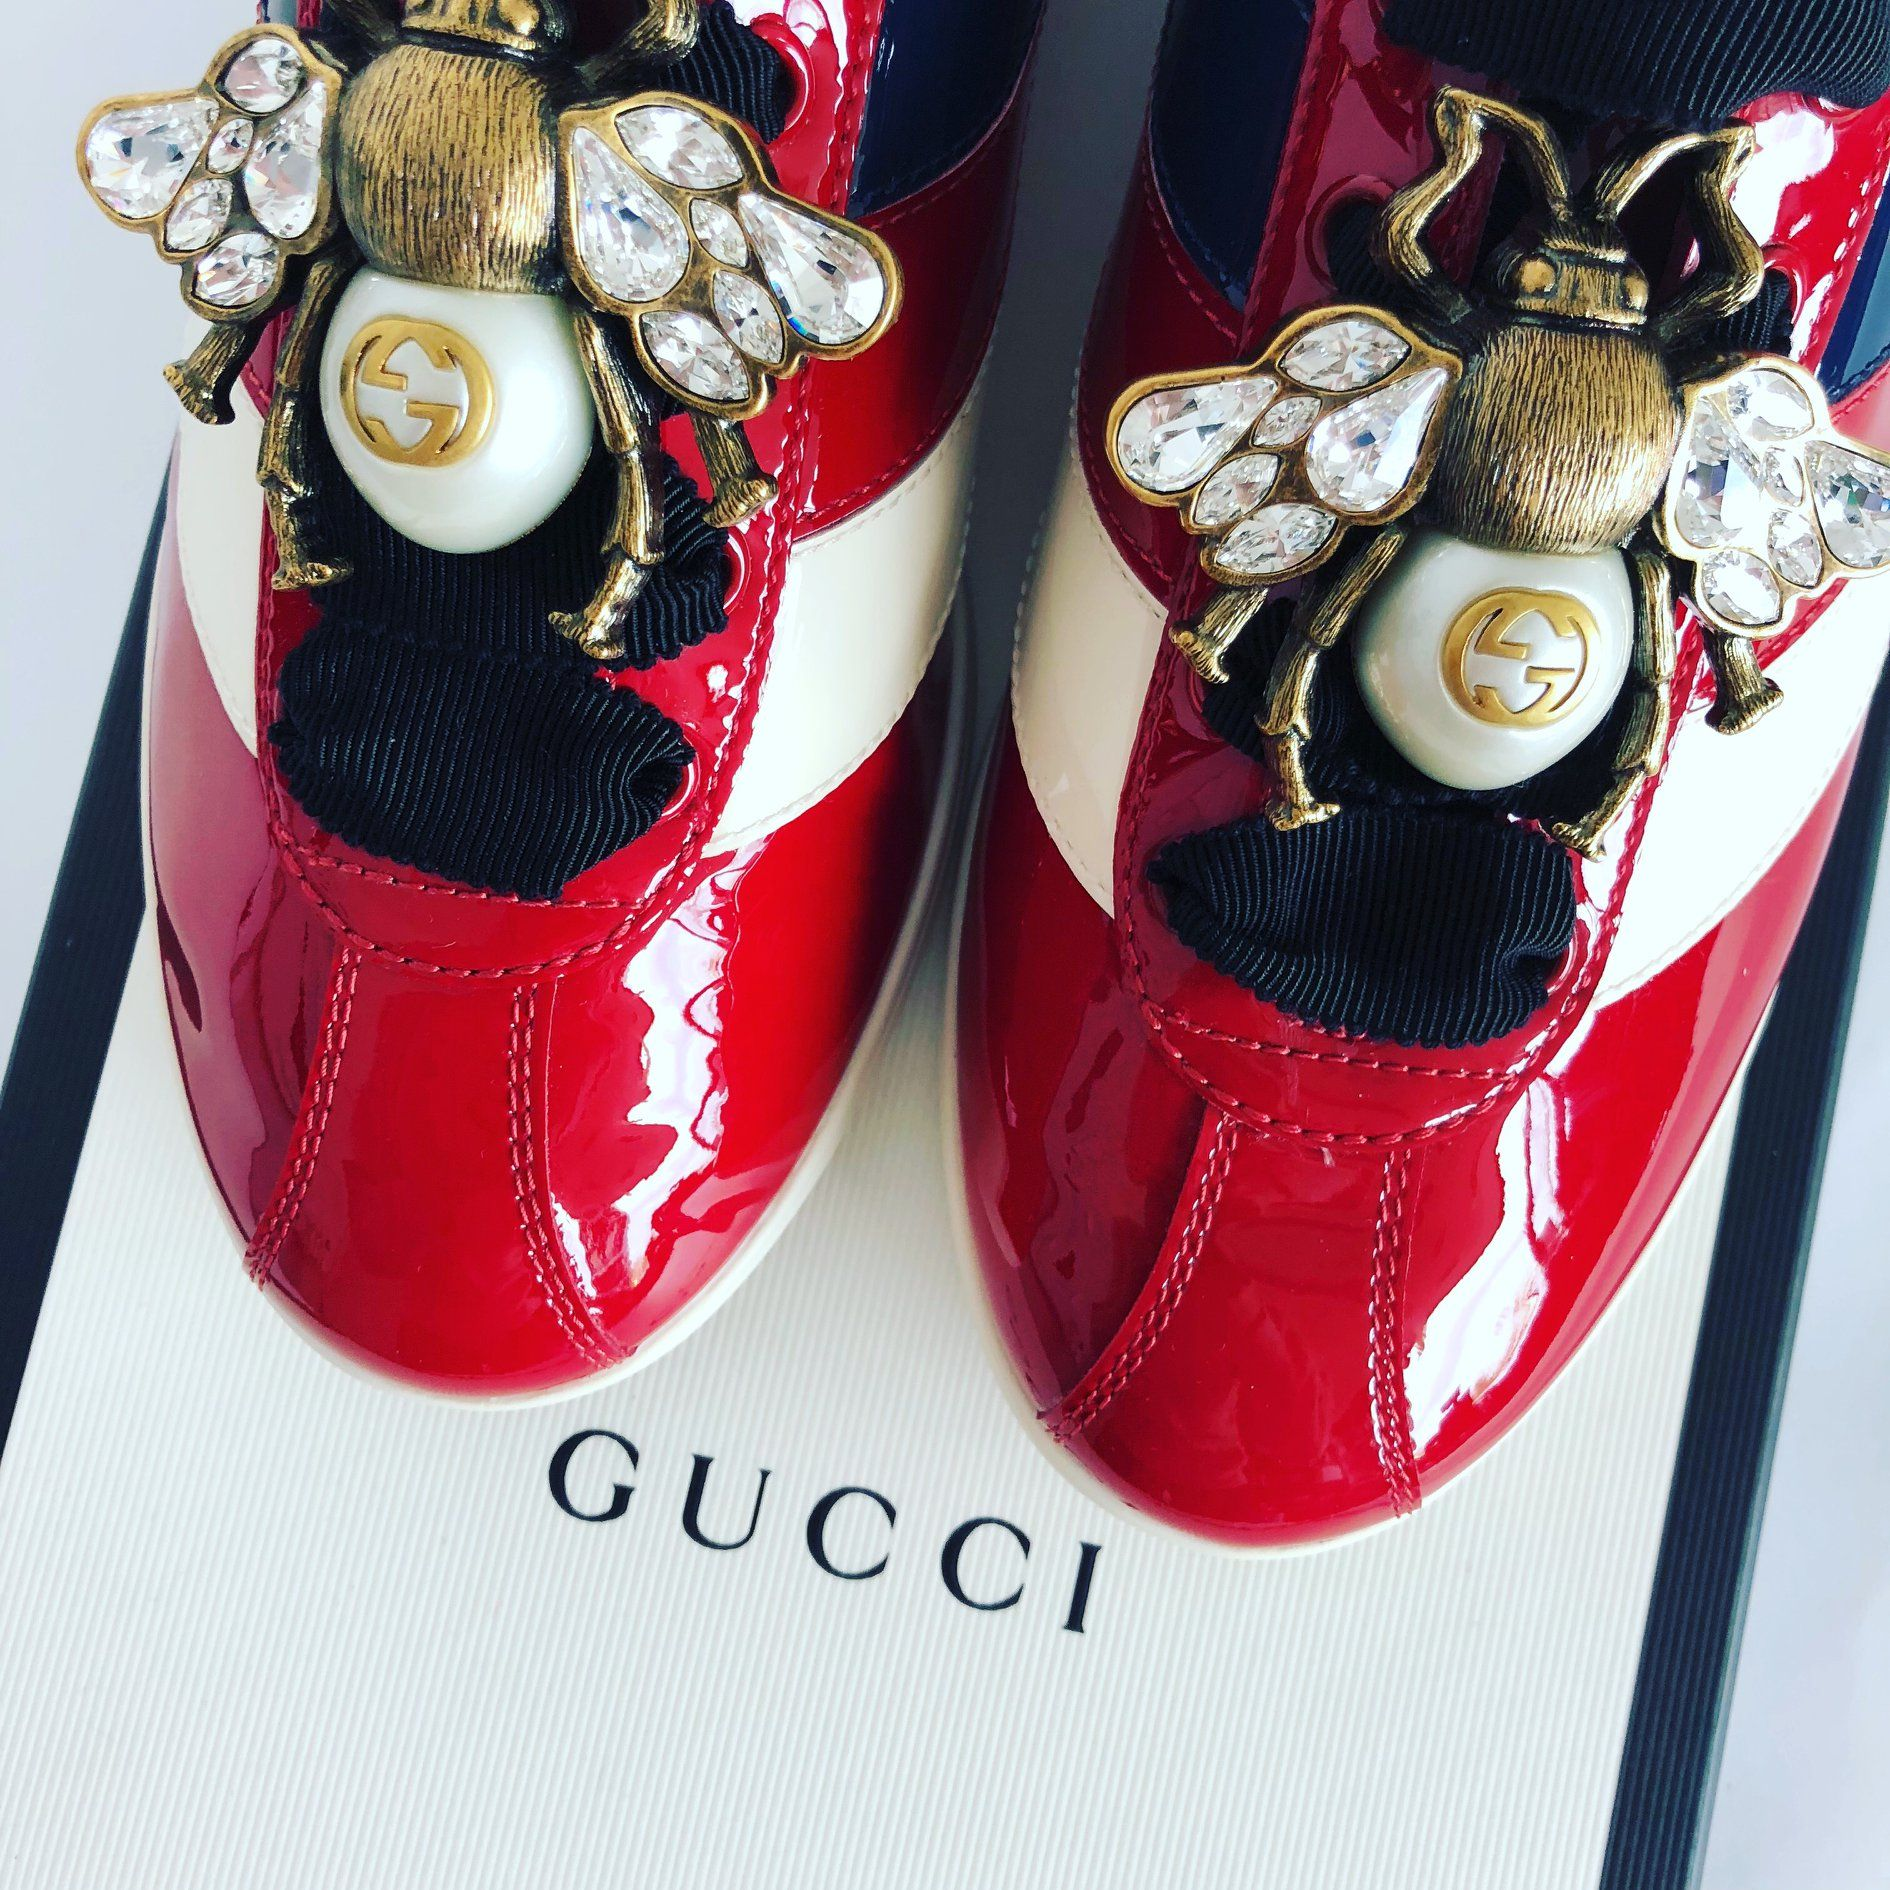 Buty Gucci Gucci Shoes Wedding Sneaker